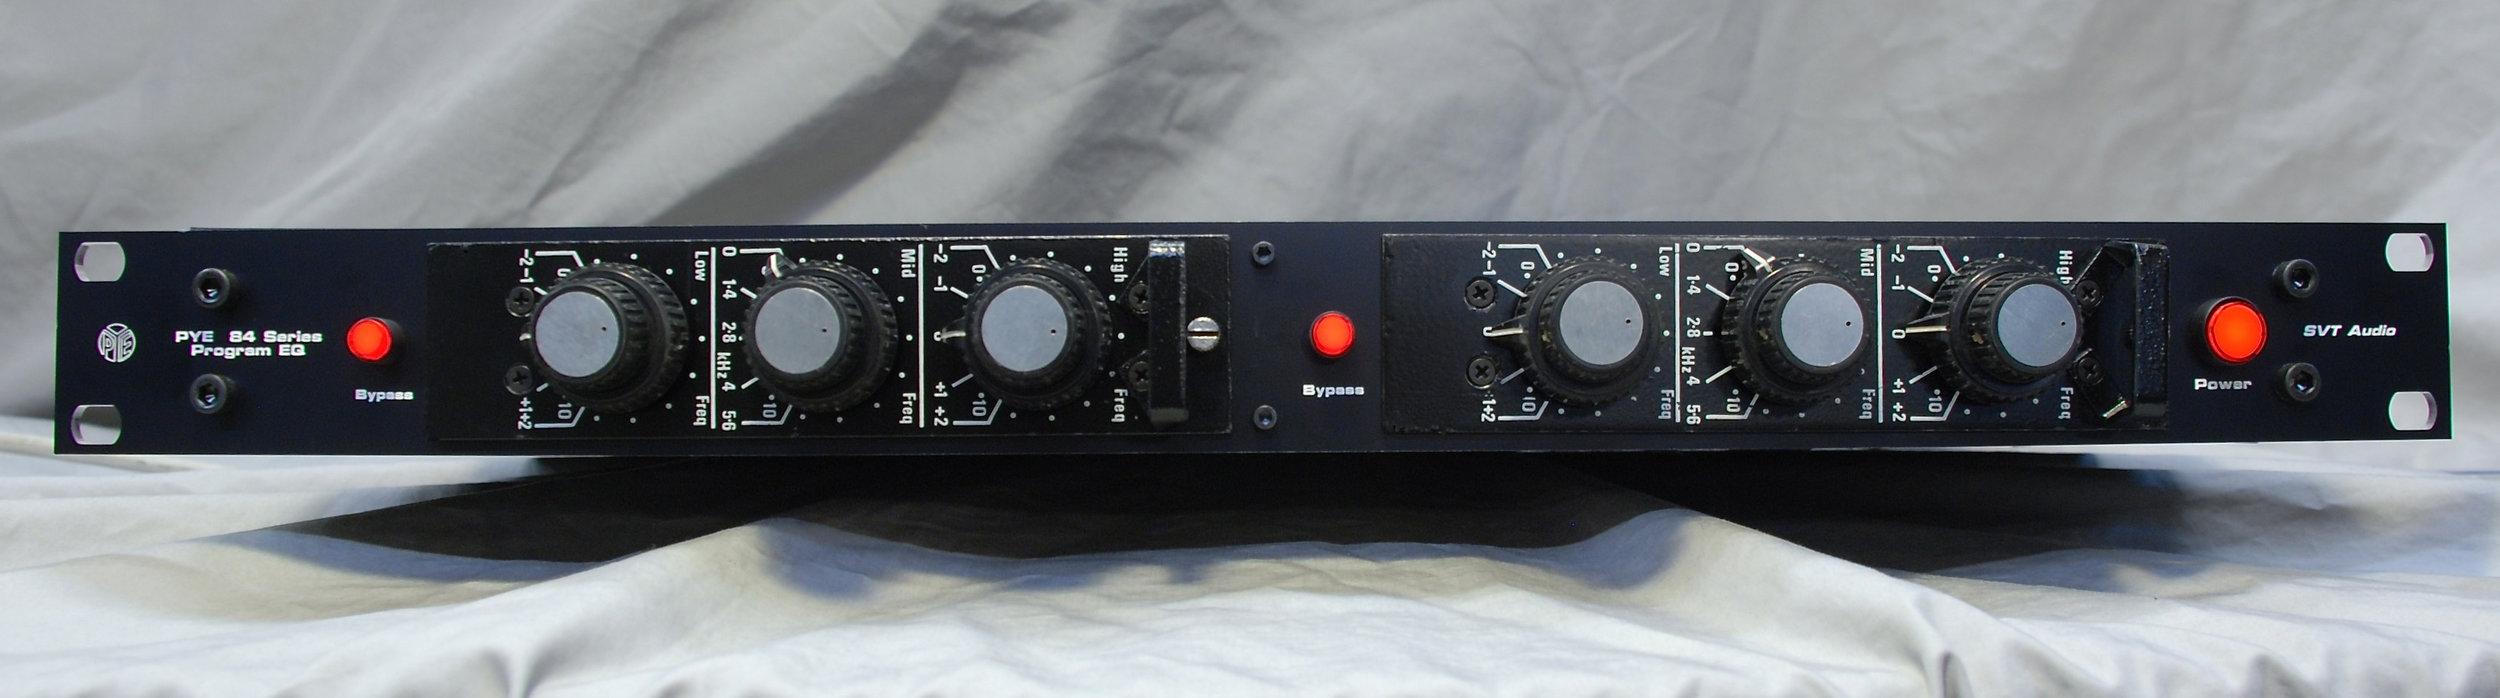 PYE 84 Series EQ.jpg